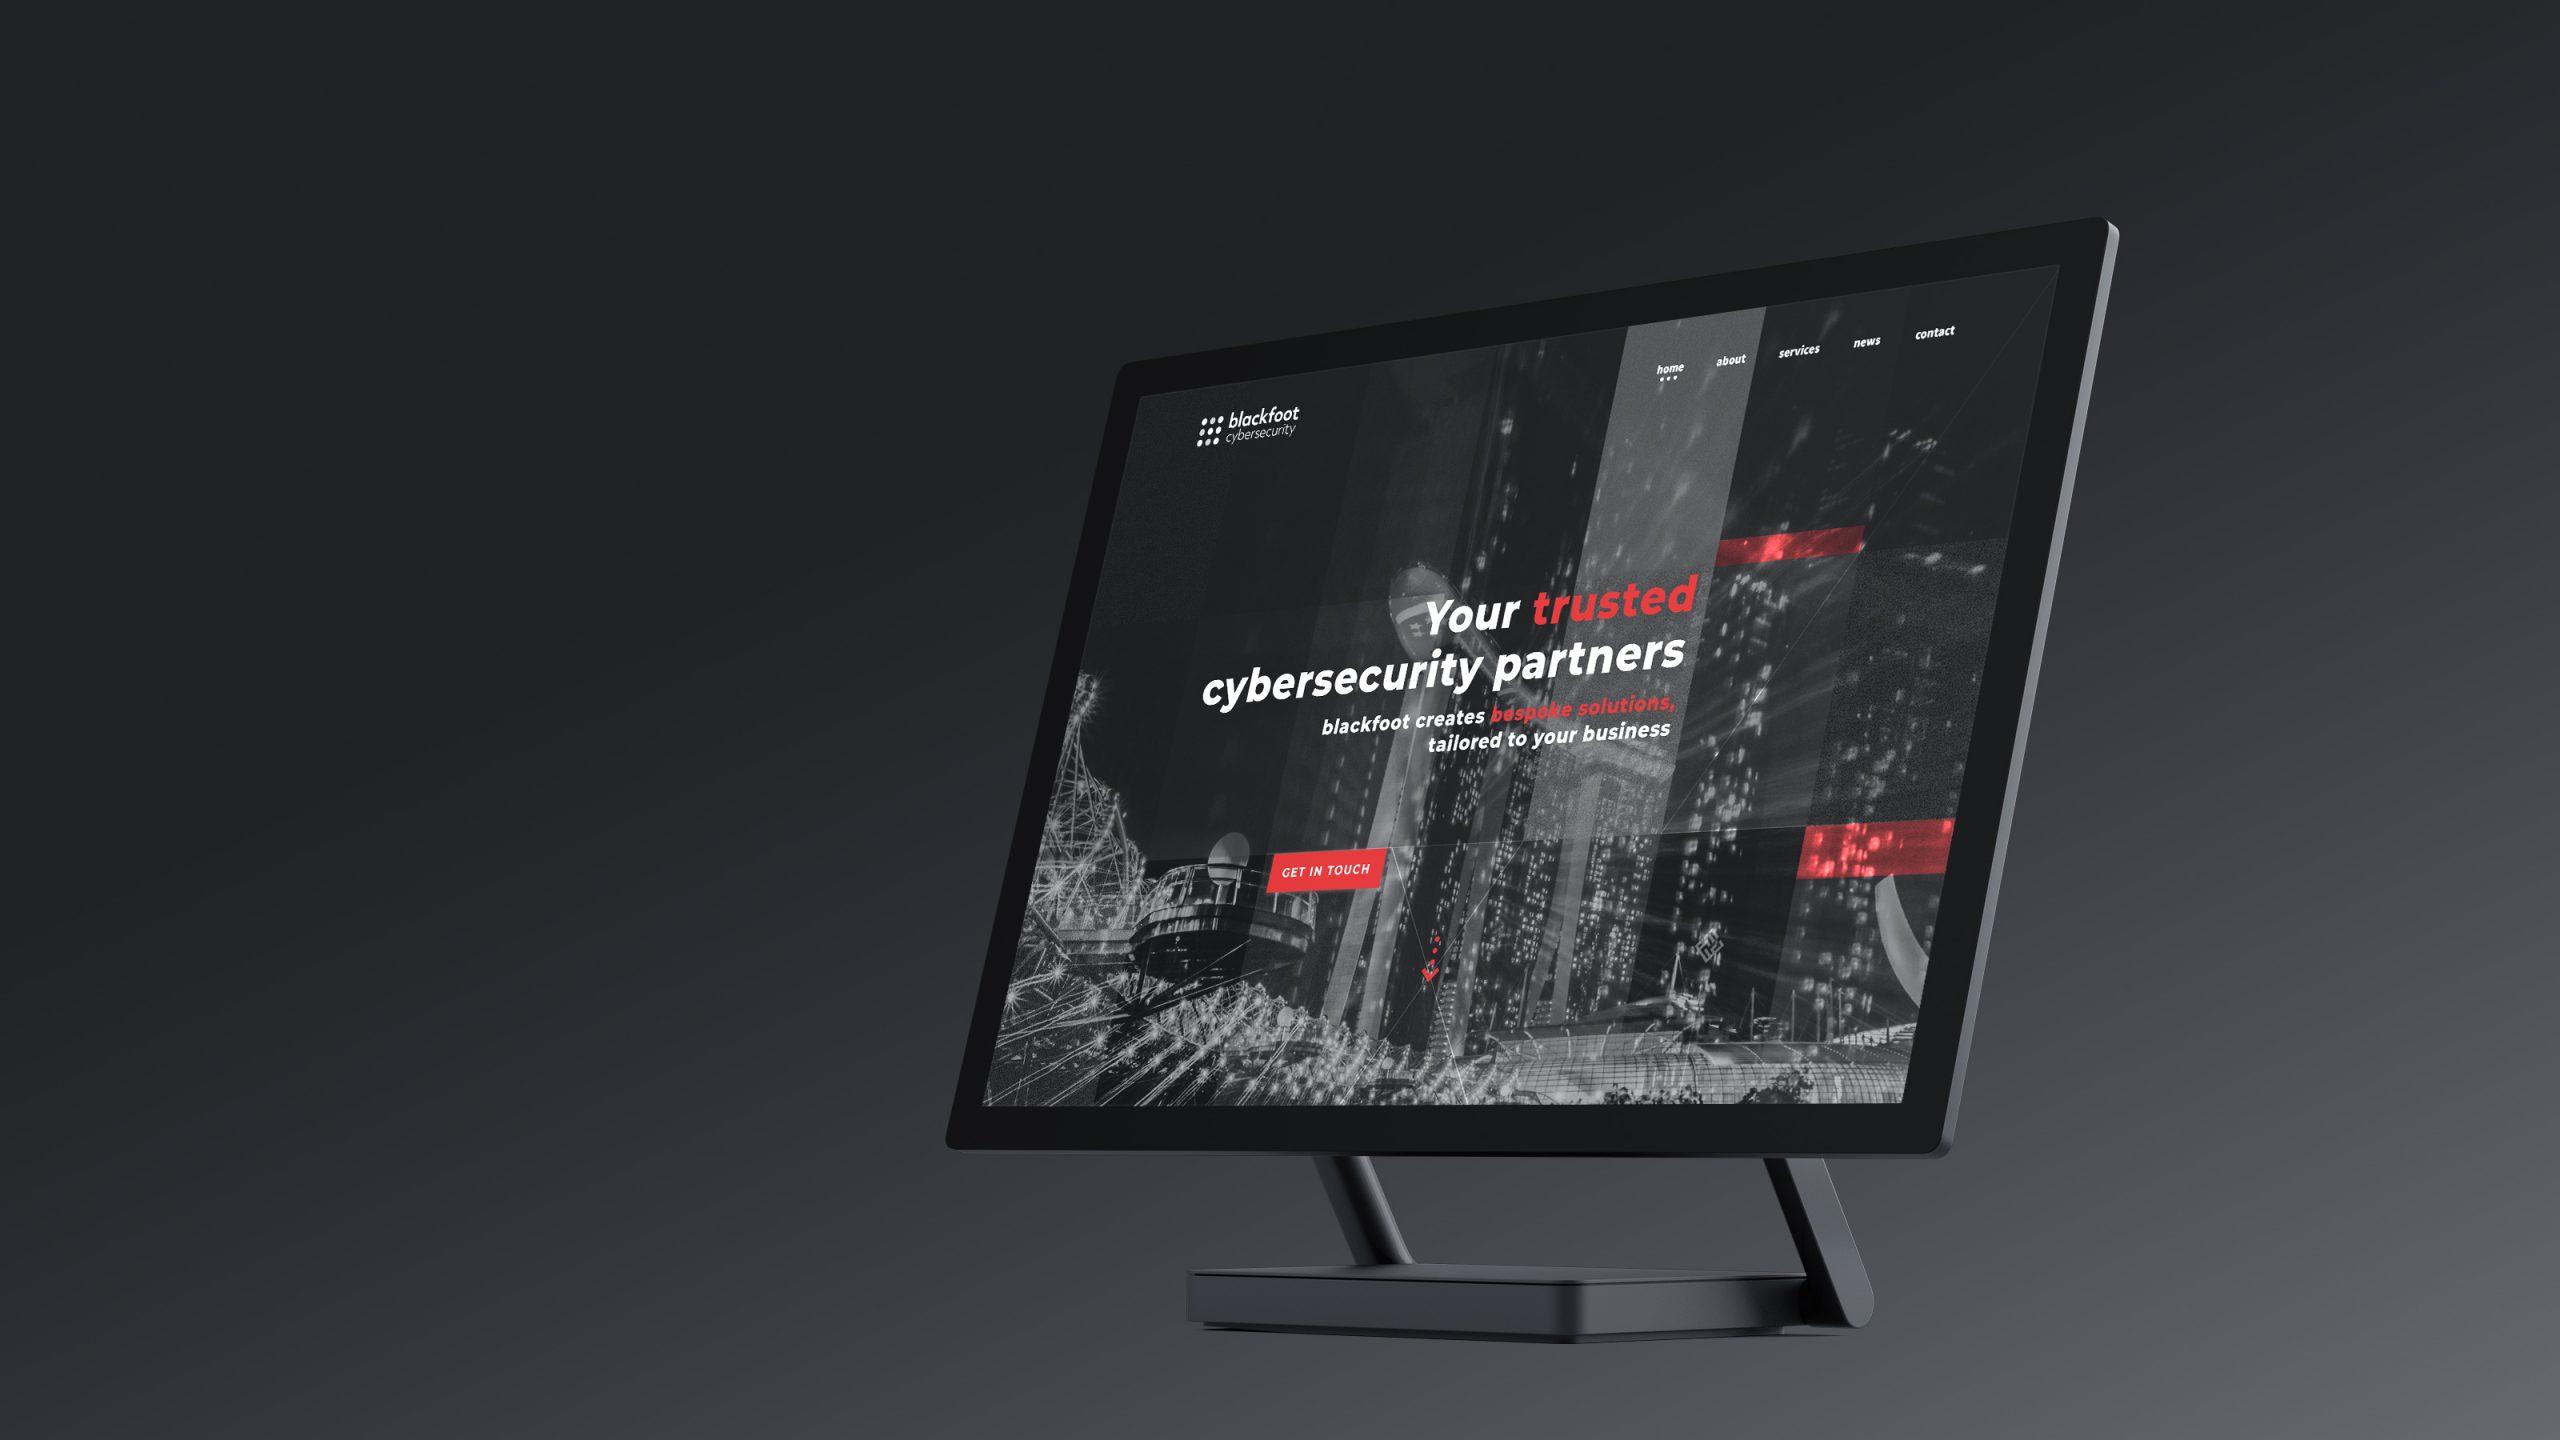 blackfoot homepage design on monitor